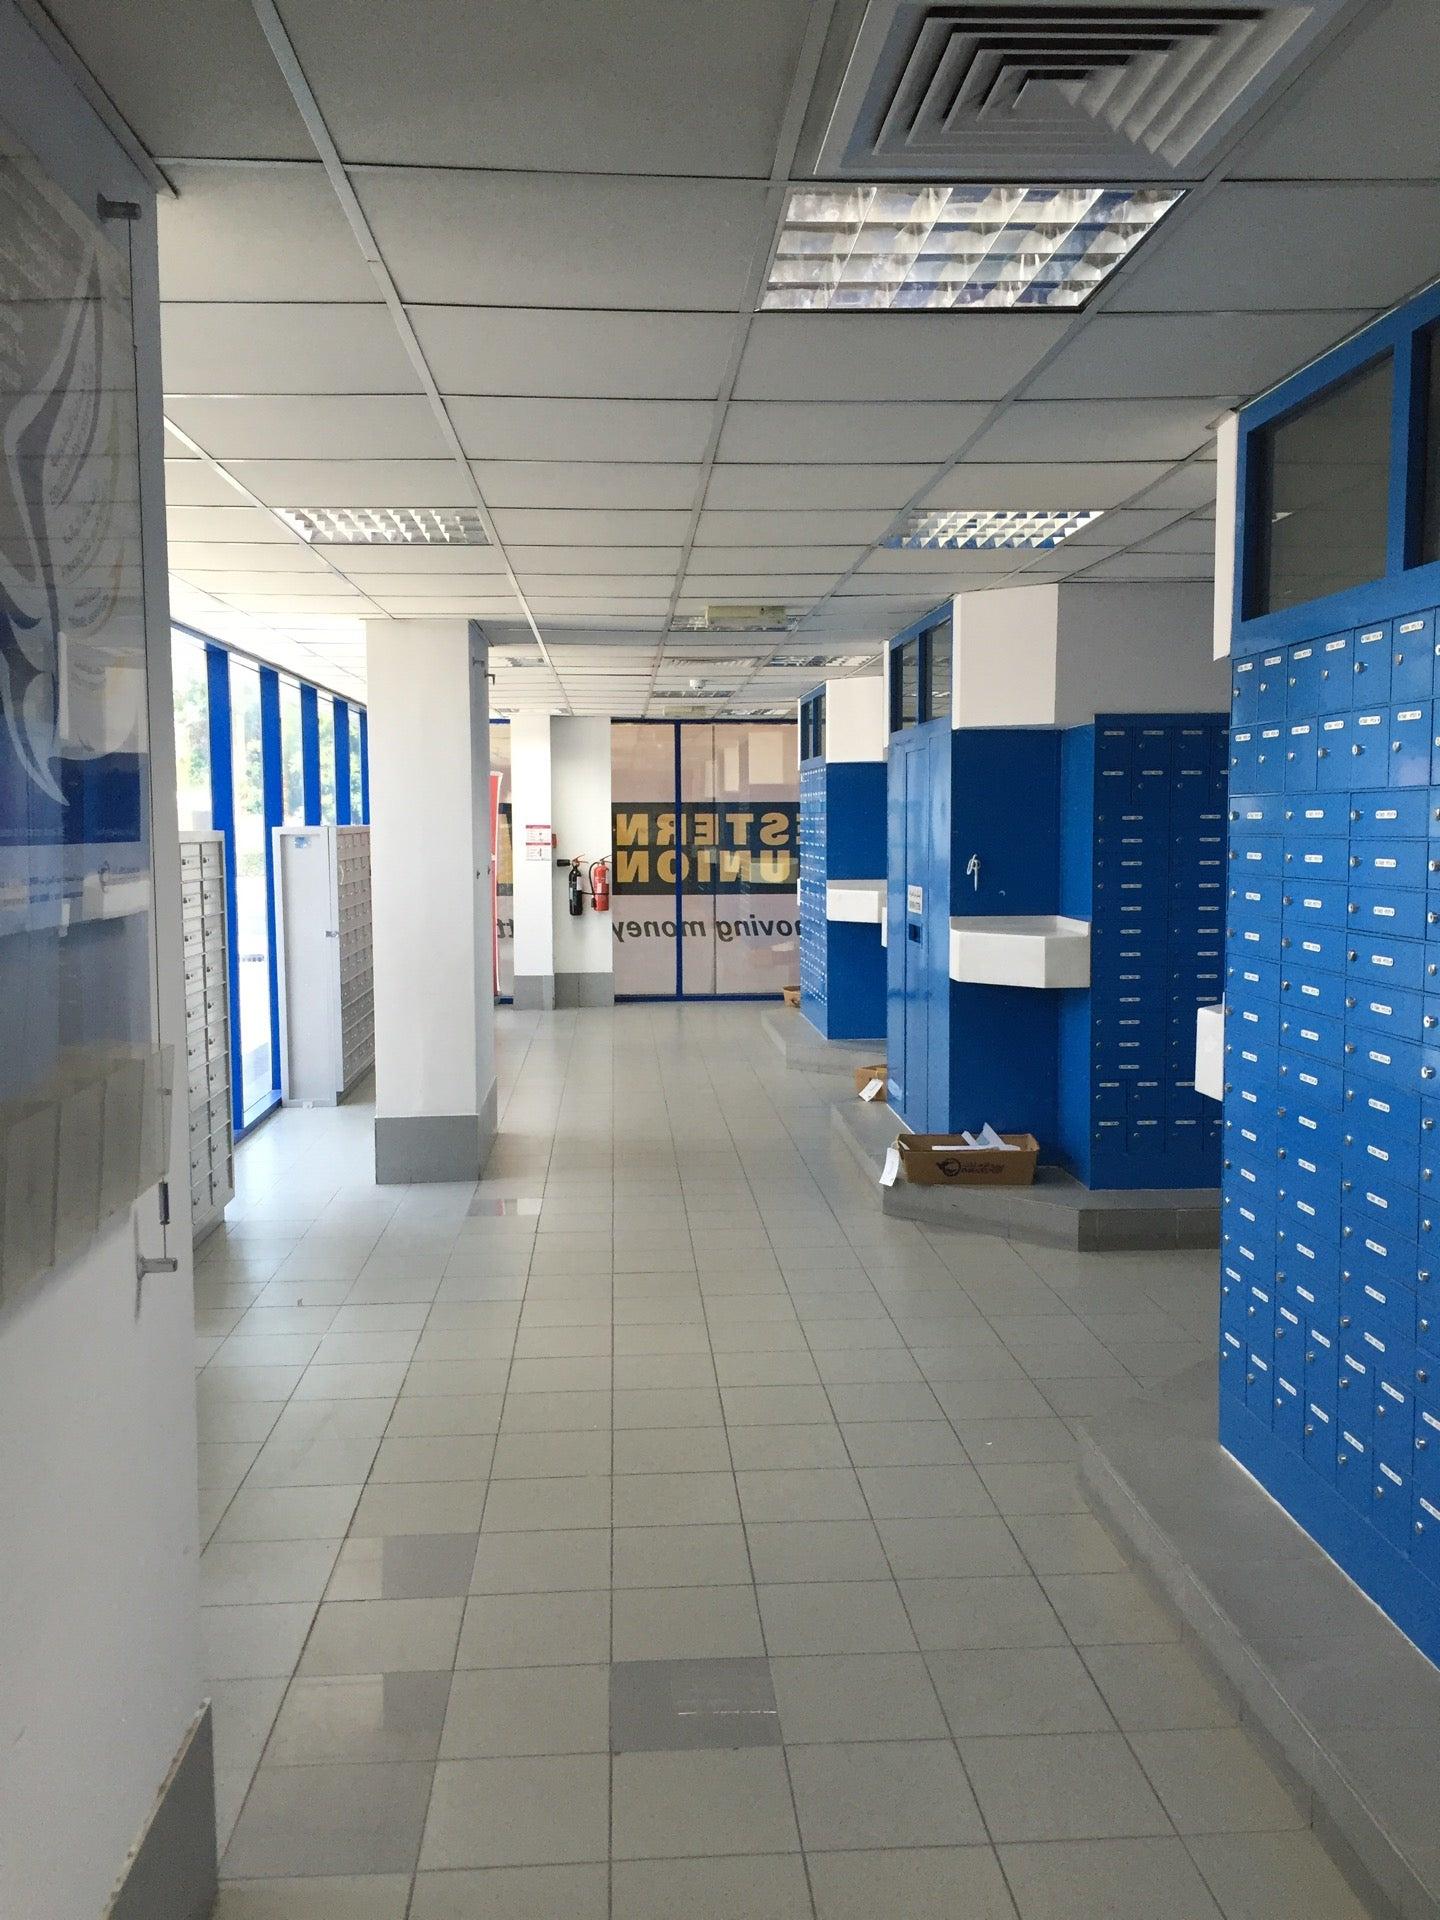 dubai directory - Emirates Post Office